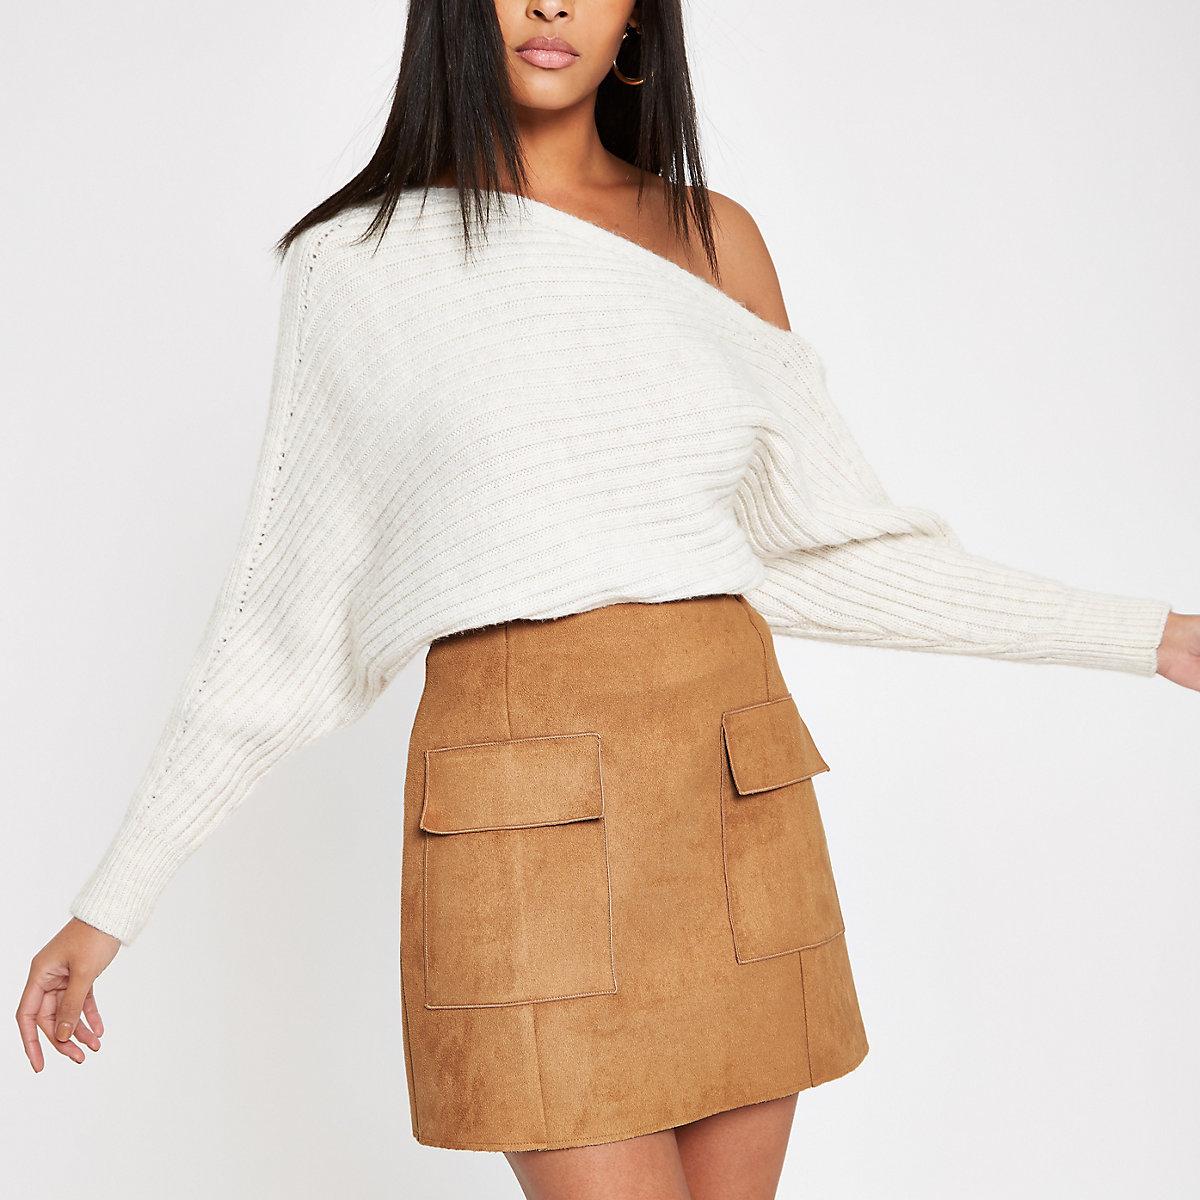 Light brown suede mini skirt